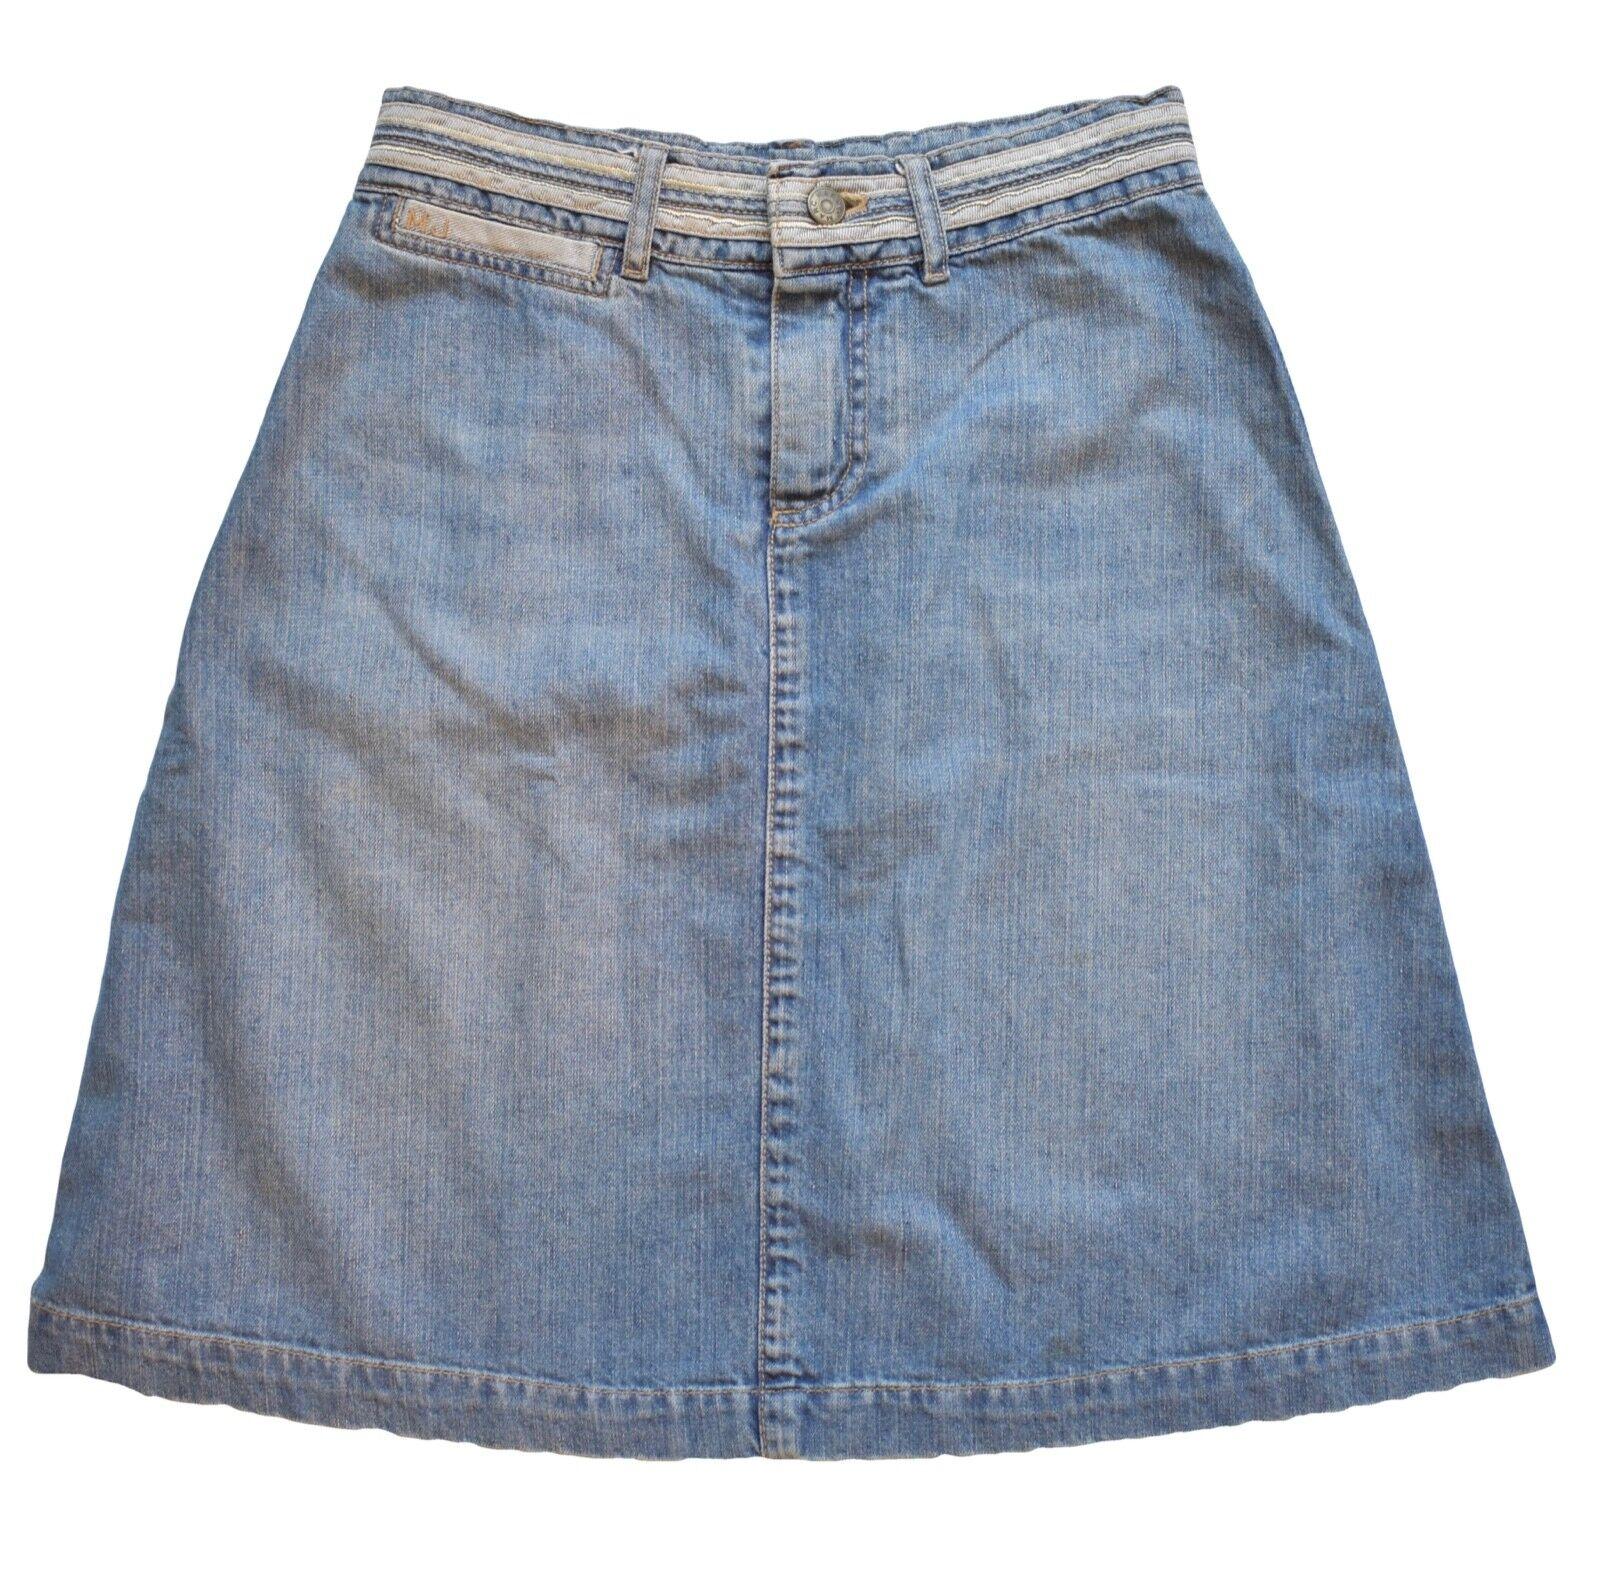 Marc Jacobs Denim Jean Skirt Size 2 Medium Wash A-Line Knee Length